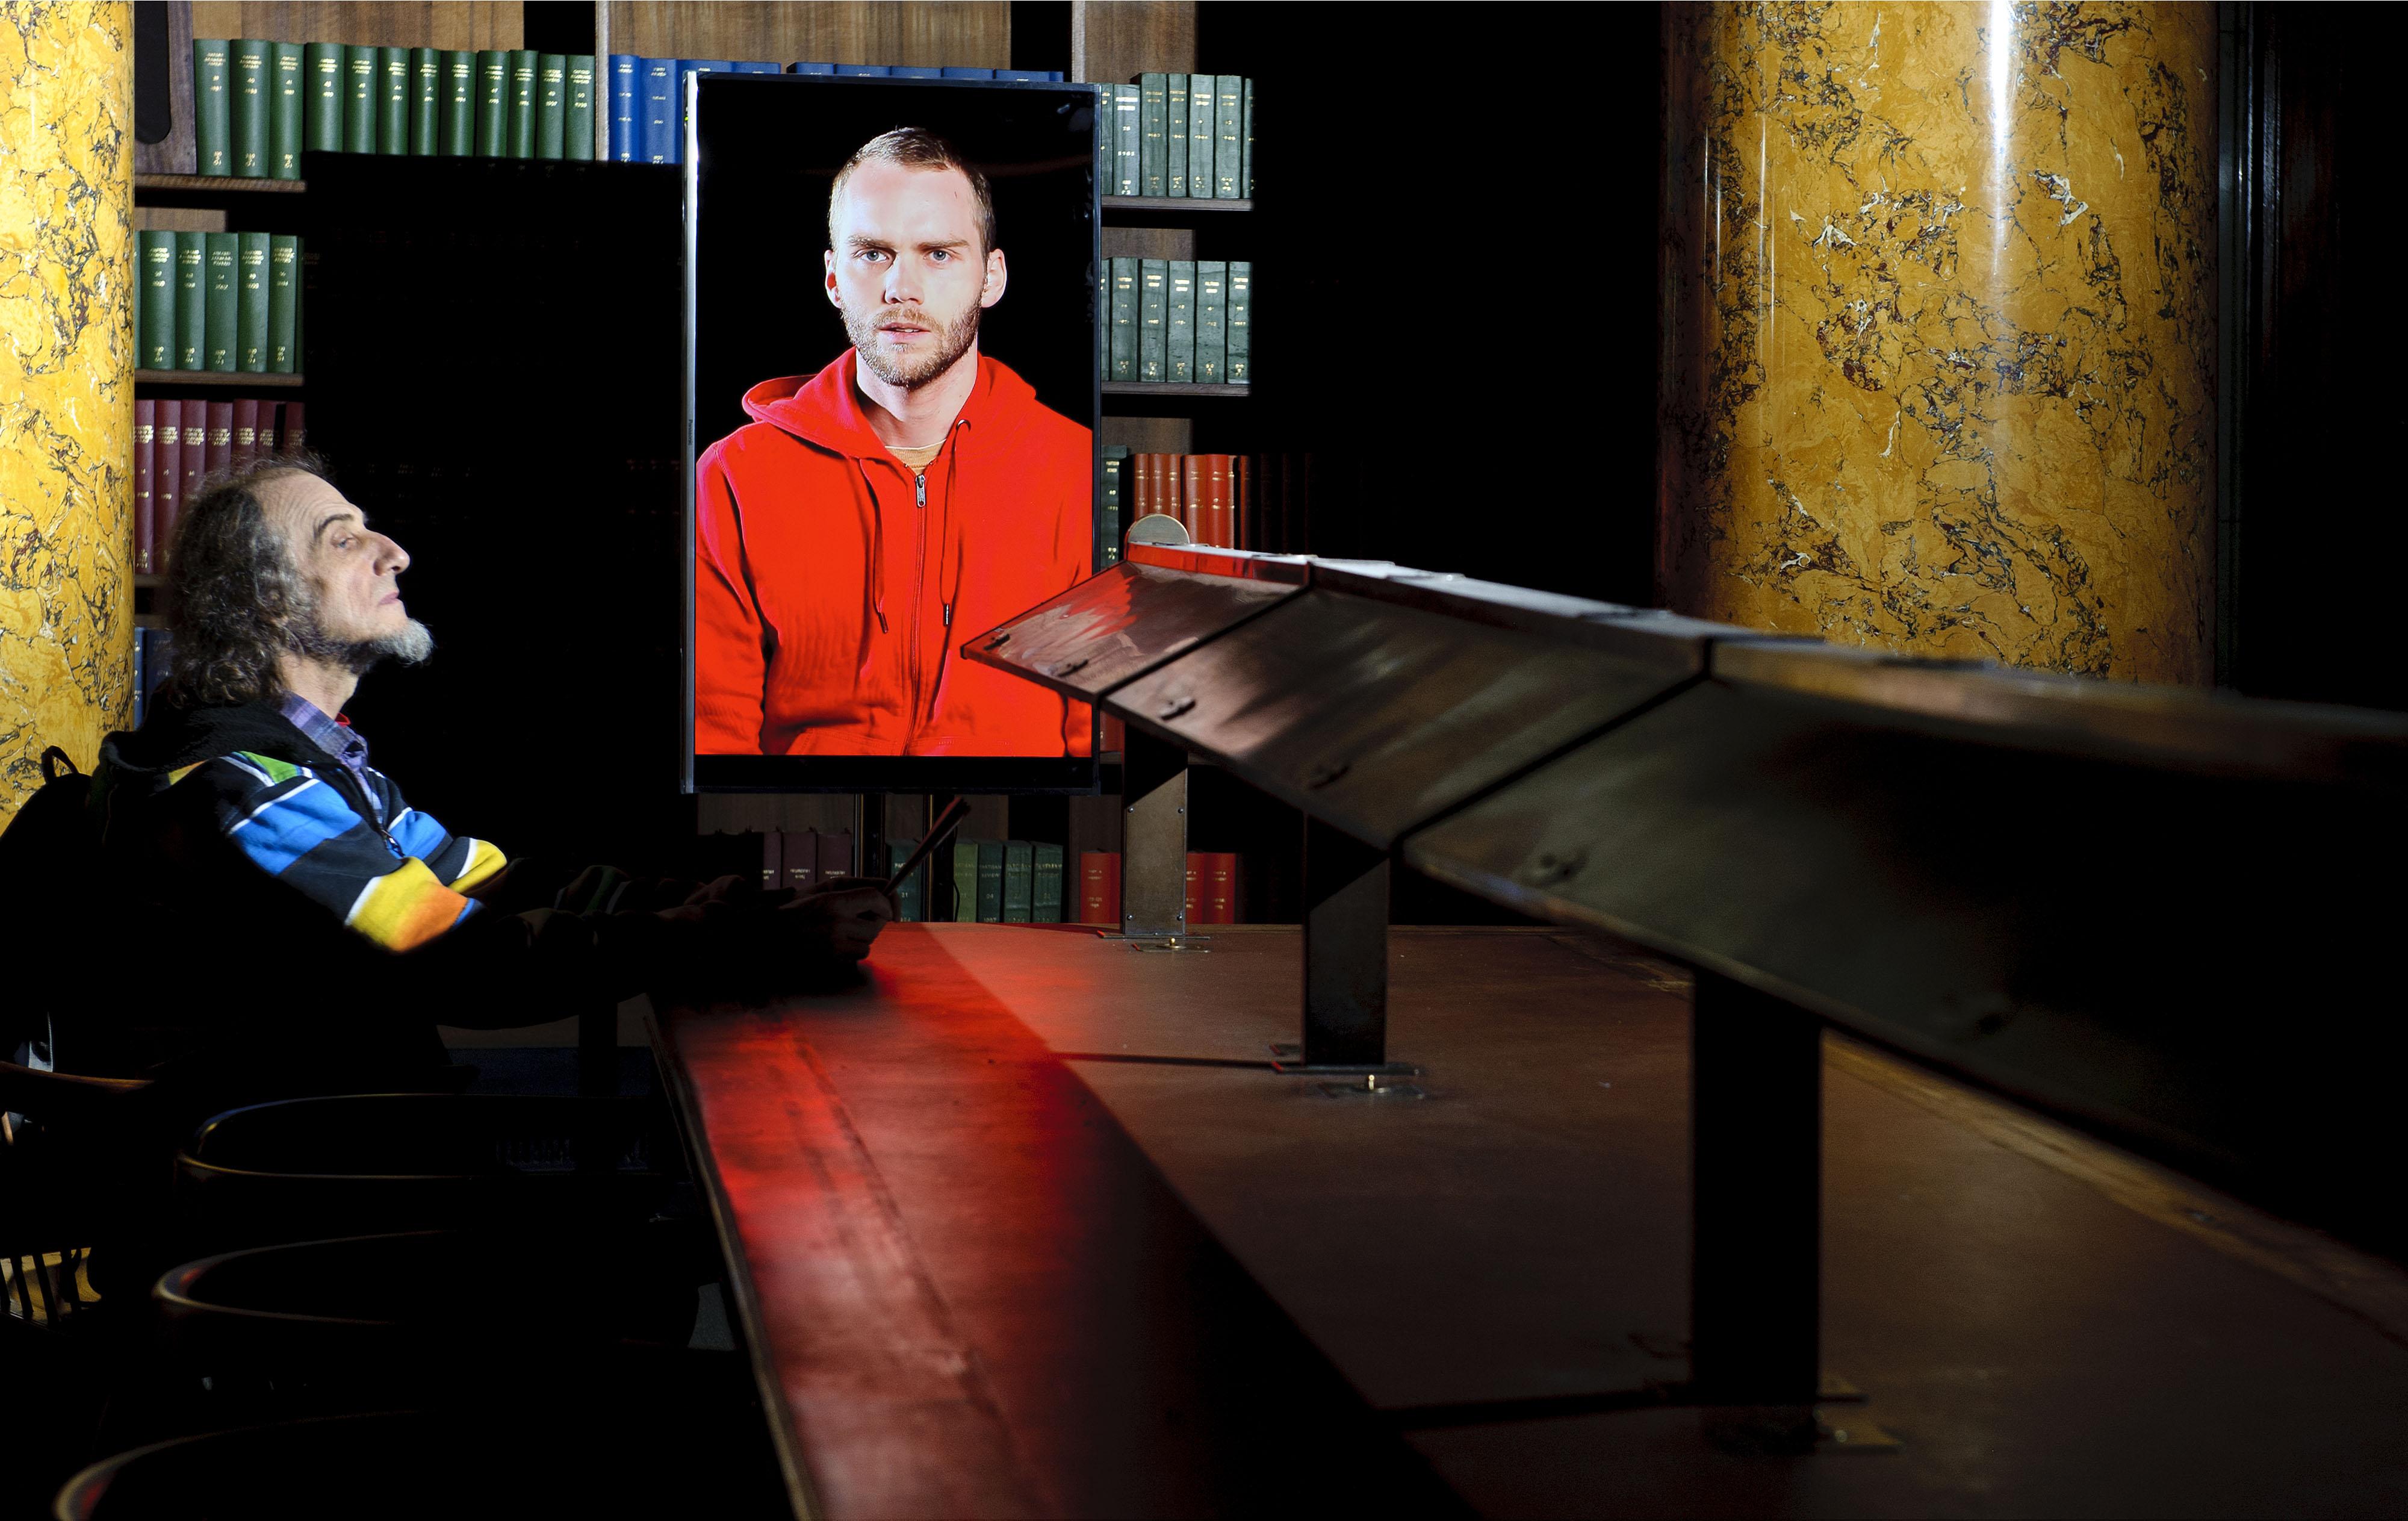 Eyvind Gulbrandsen_Surrounded By Strangers_JCF0355